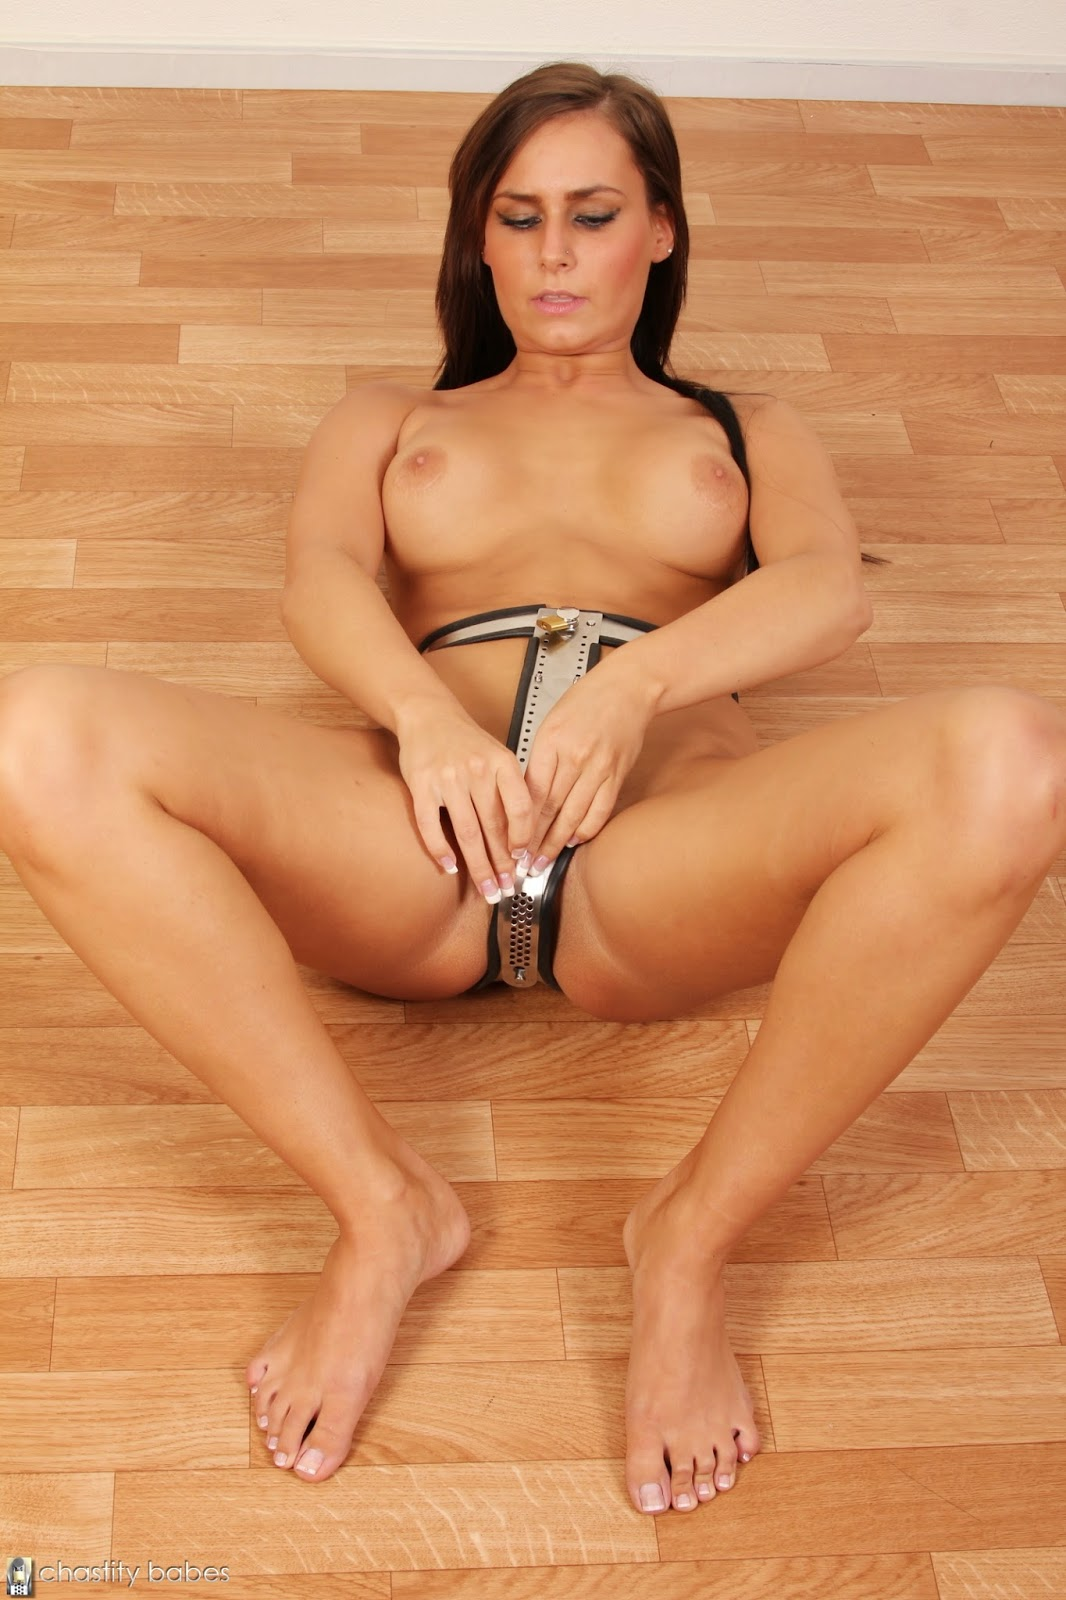 chastity bdsm video